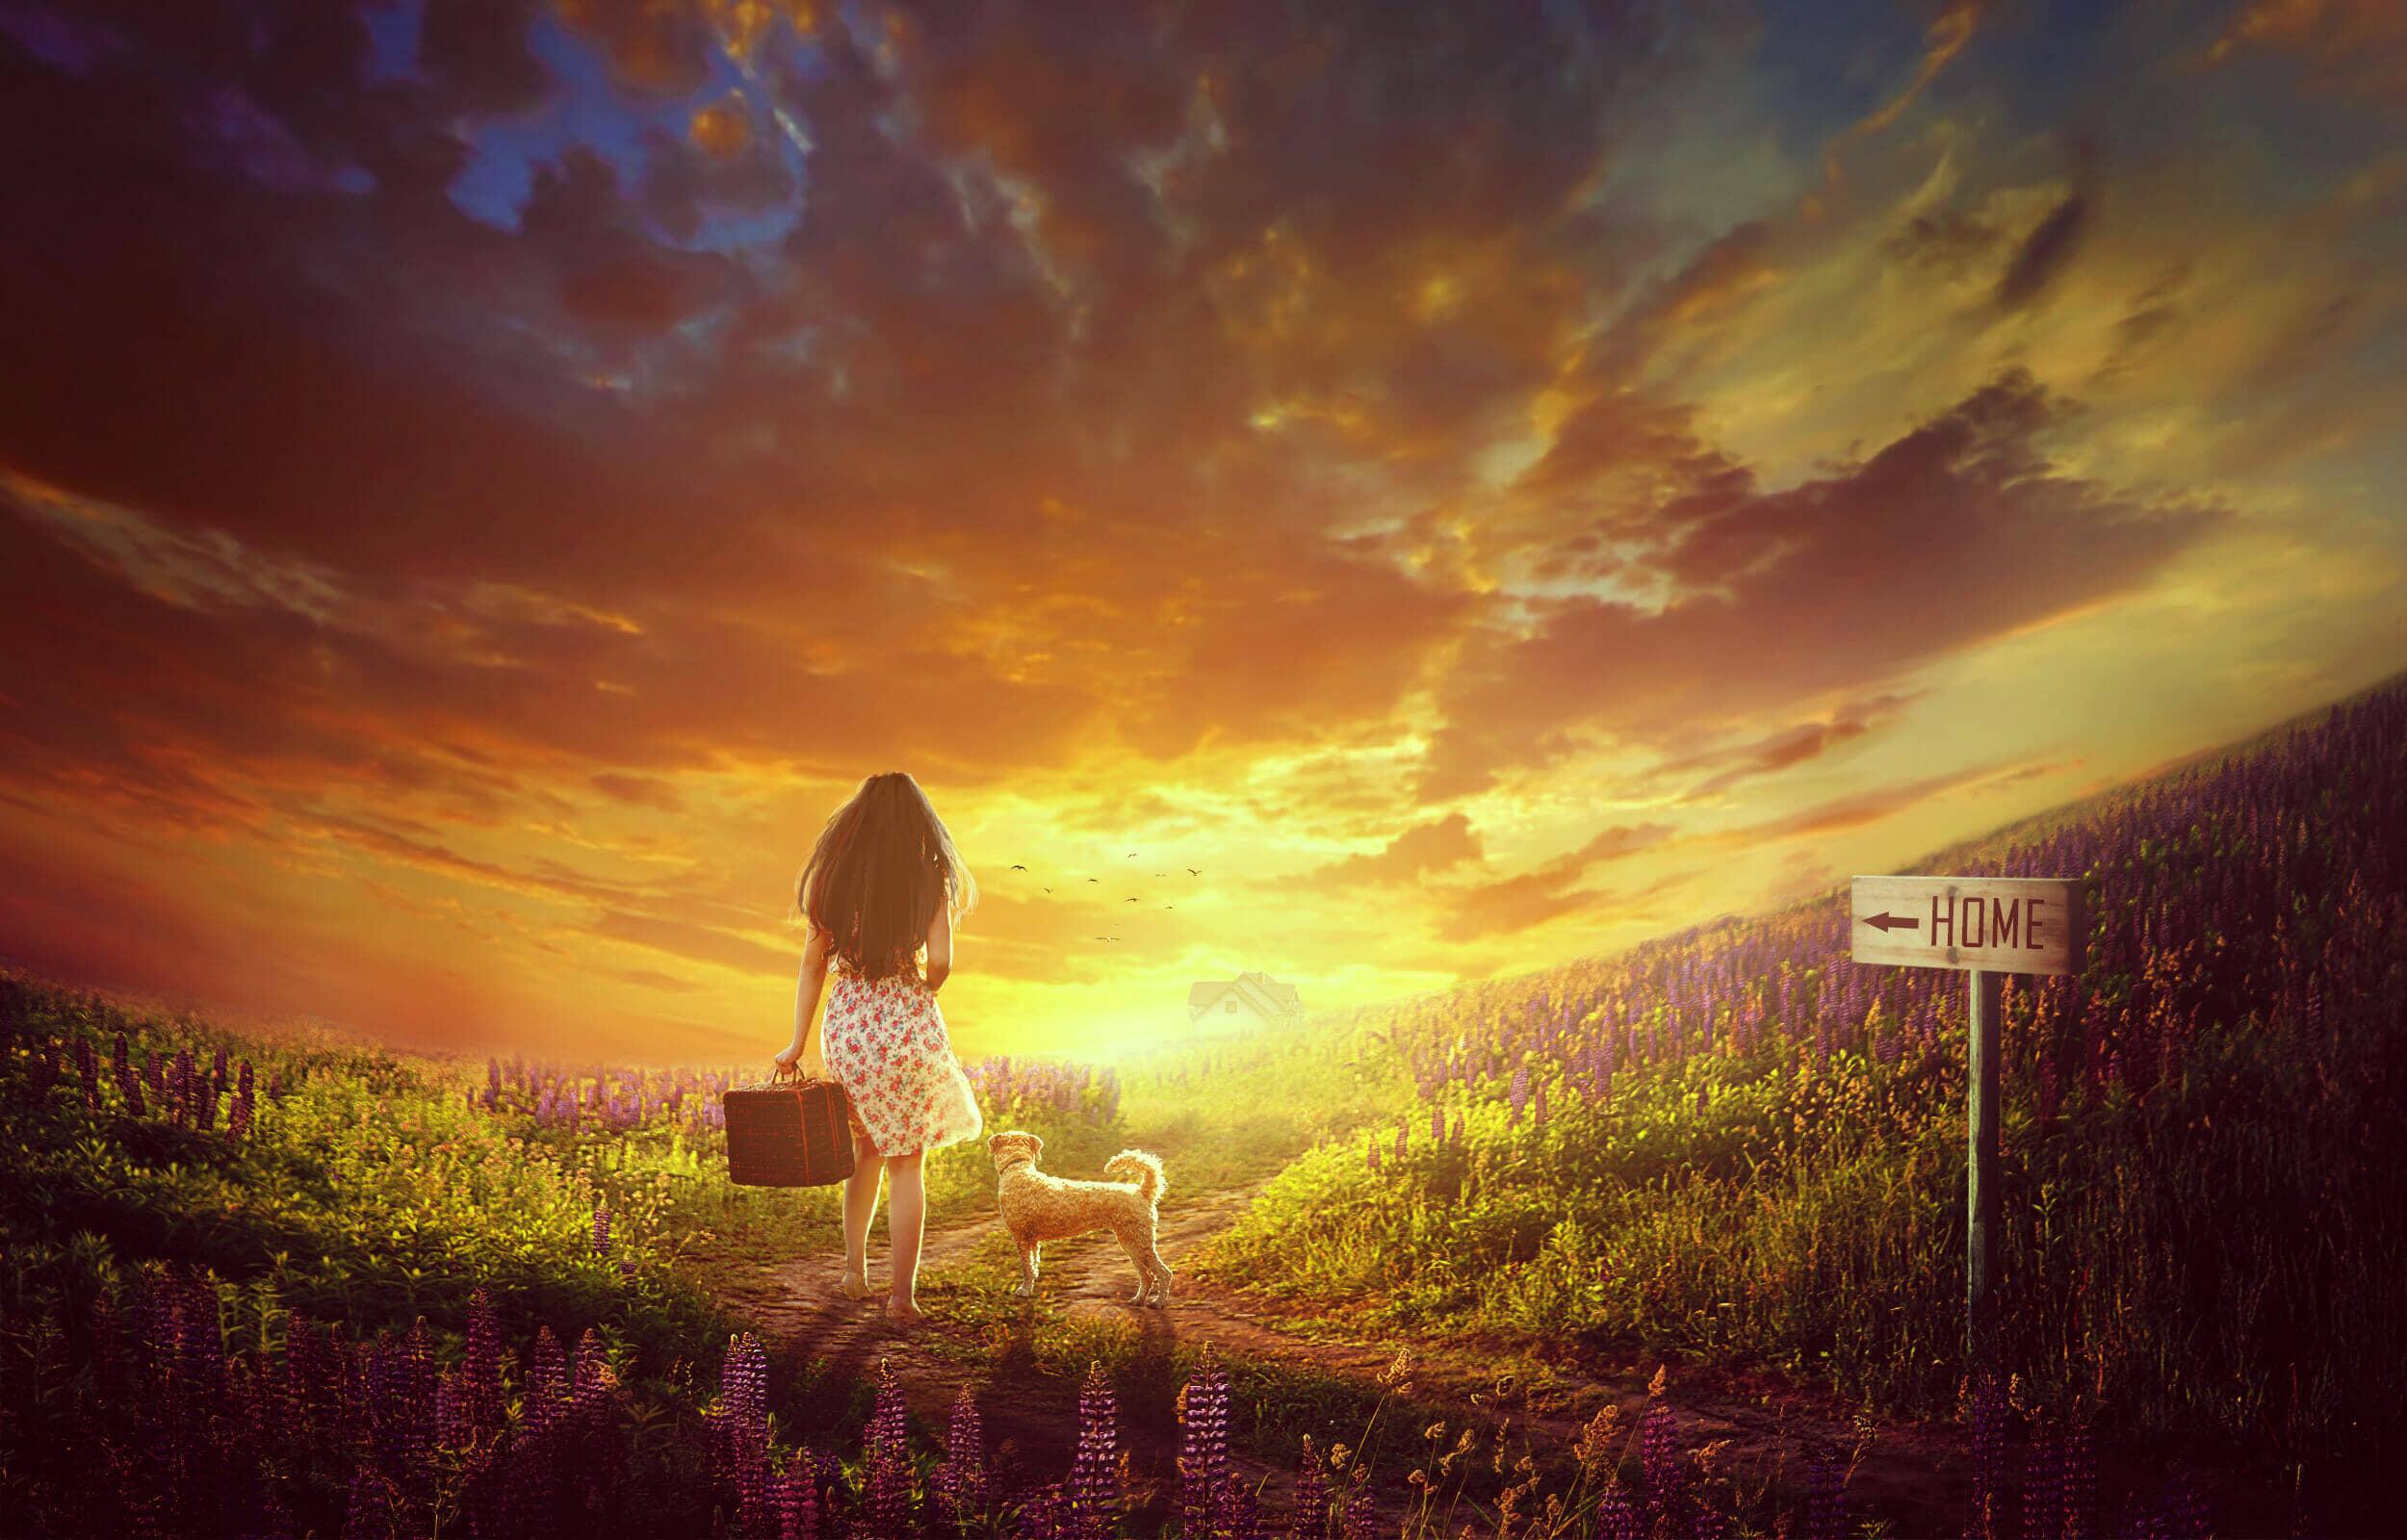 How to Create an Emotional Sunrise Scene Photo Manipulation with Adobe Photoshop